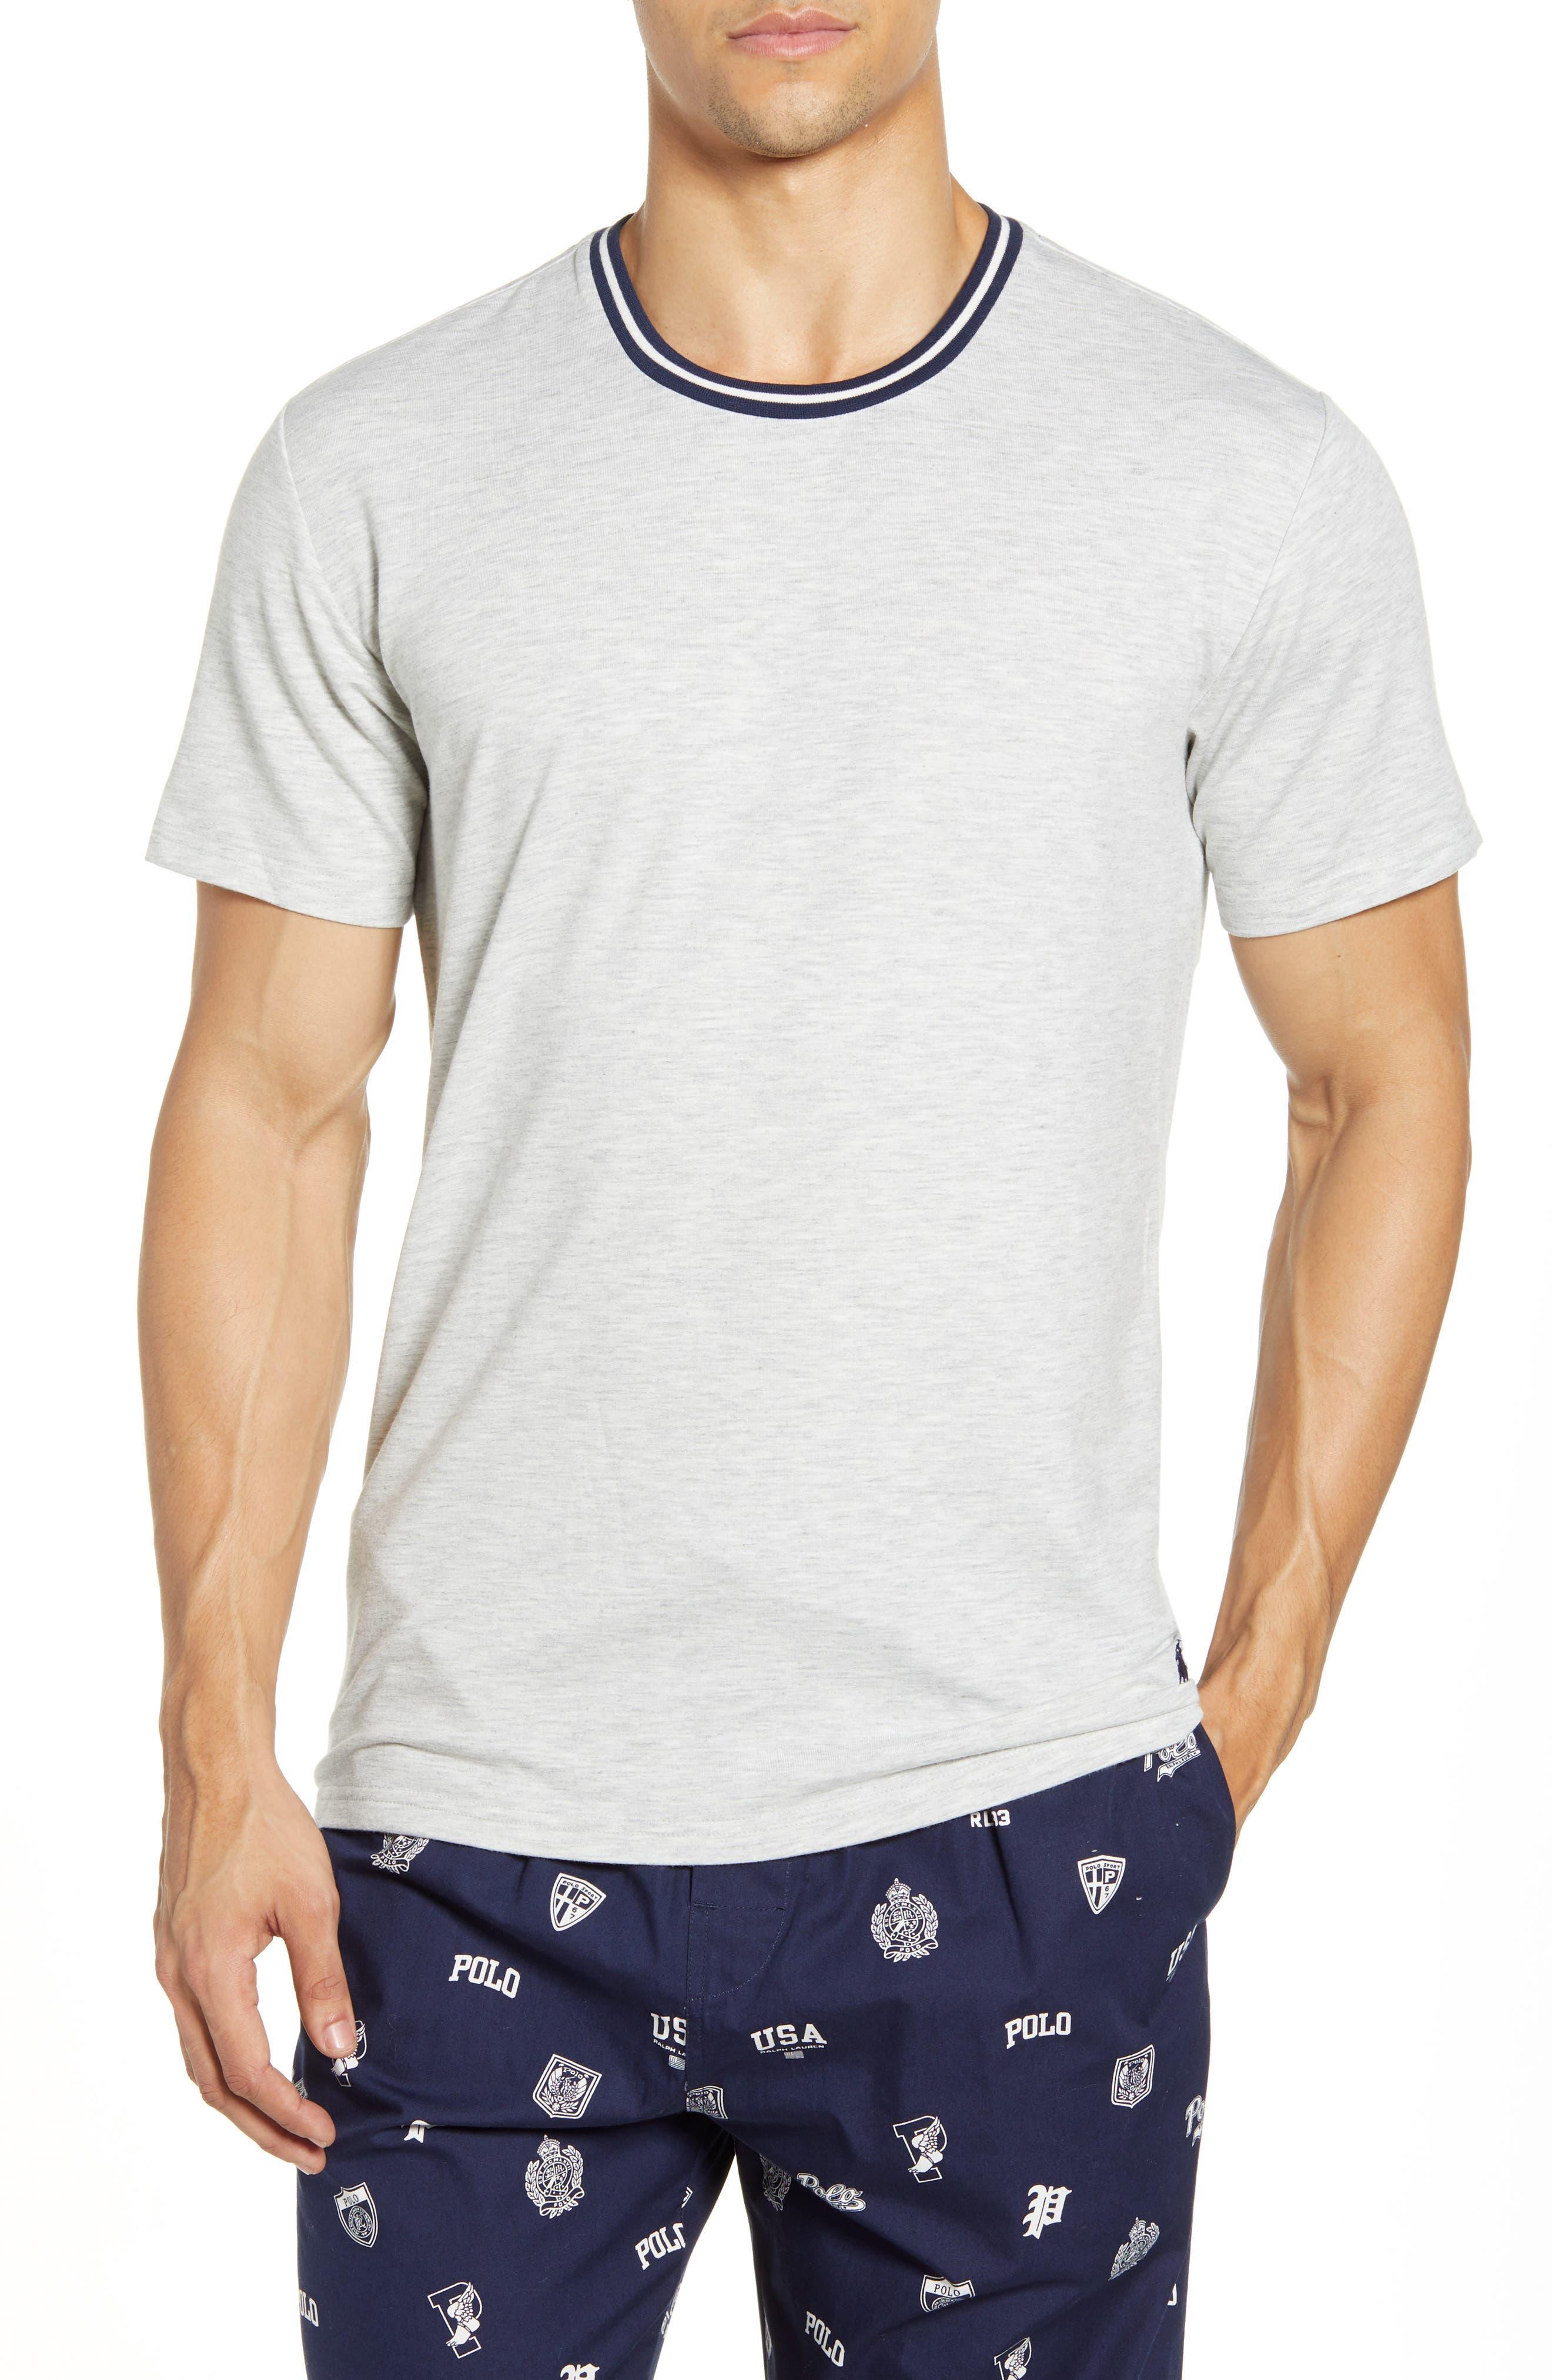 Image of Polo Ralph Lauren Short Sleeve Crew Neck Sleep Tee